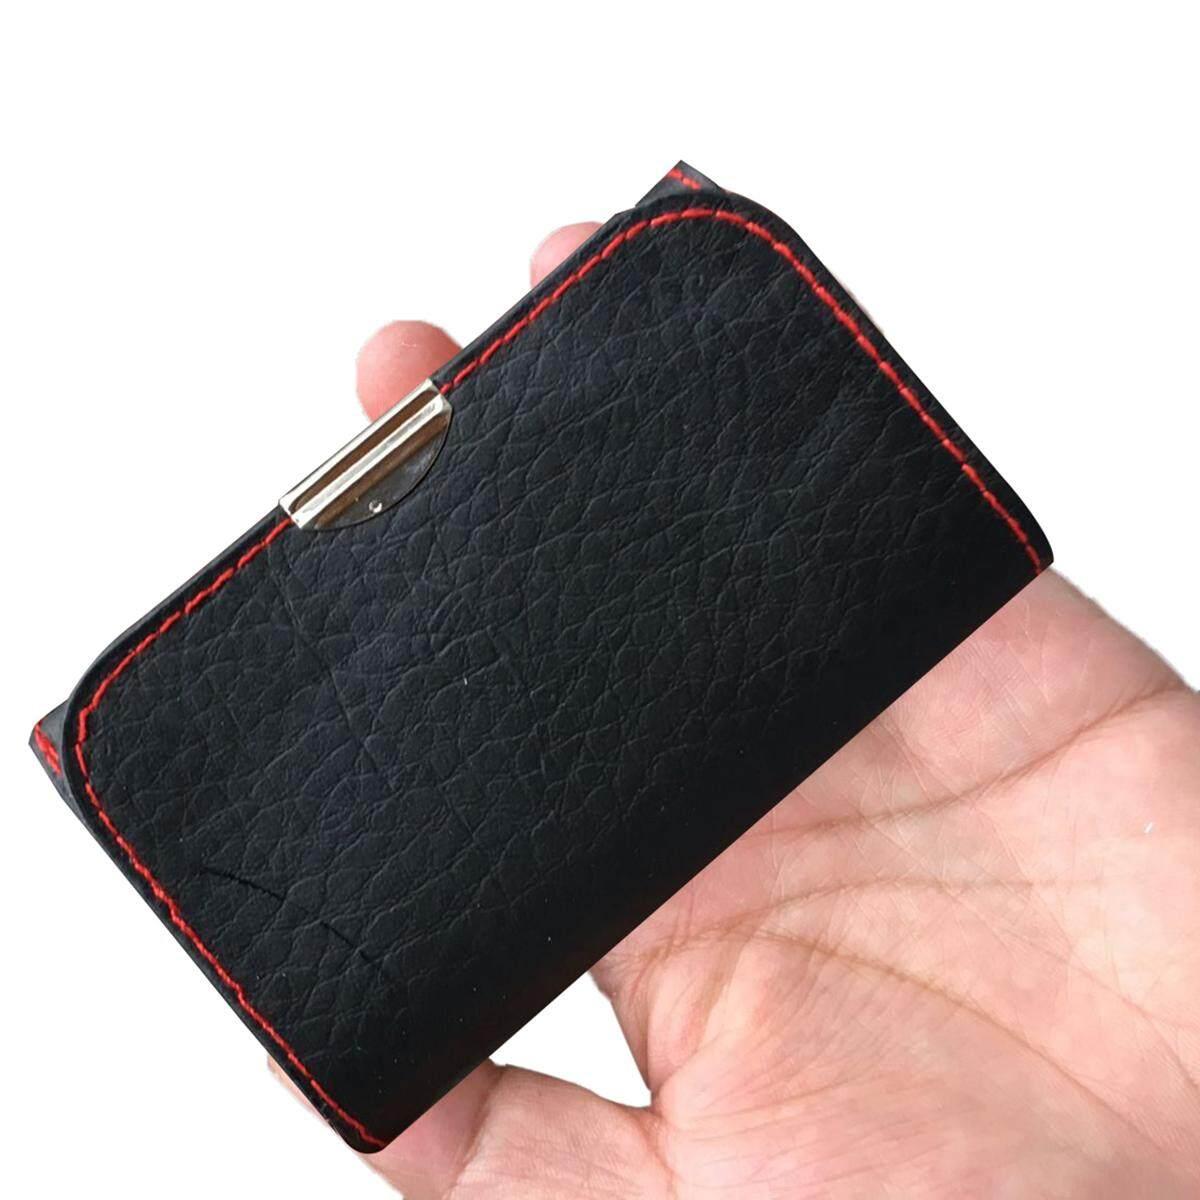 NANCH 12 in 1 Mini Precision Wallet Screwdriver Kit Repair Tool for Phones PC Laptop Drone Model